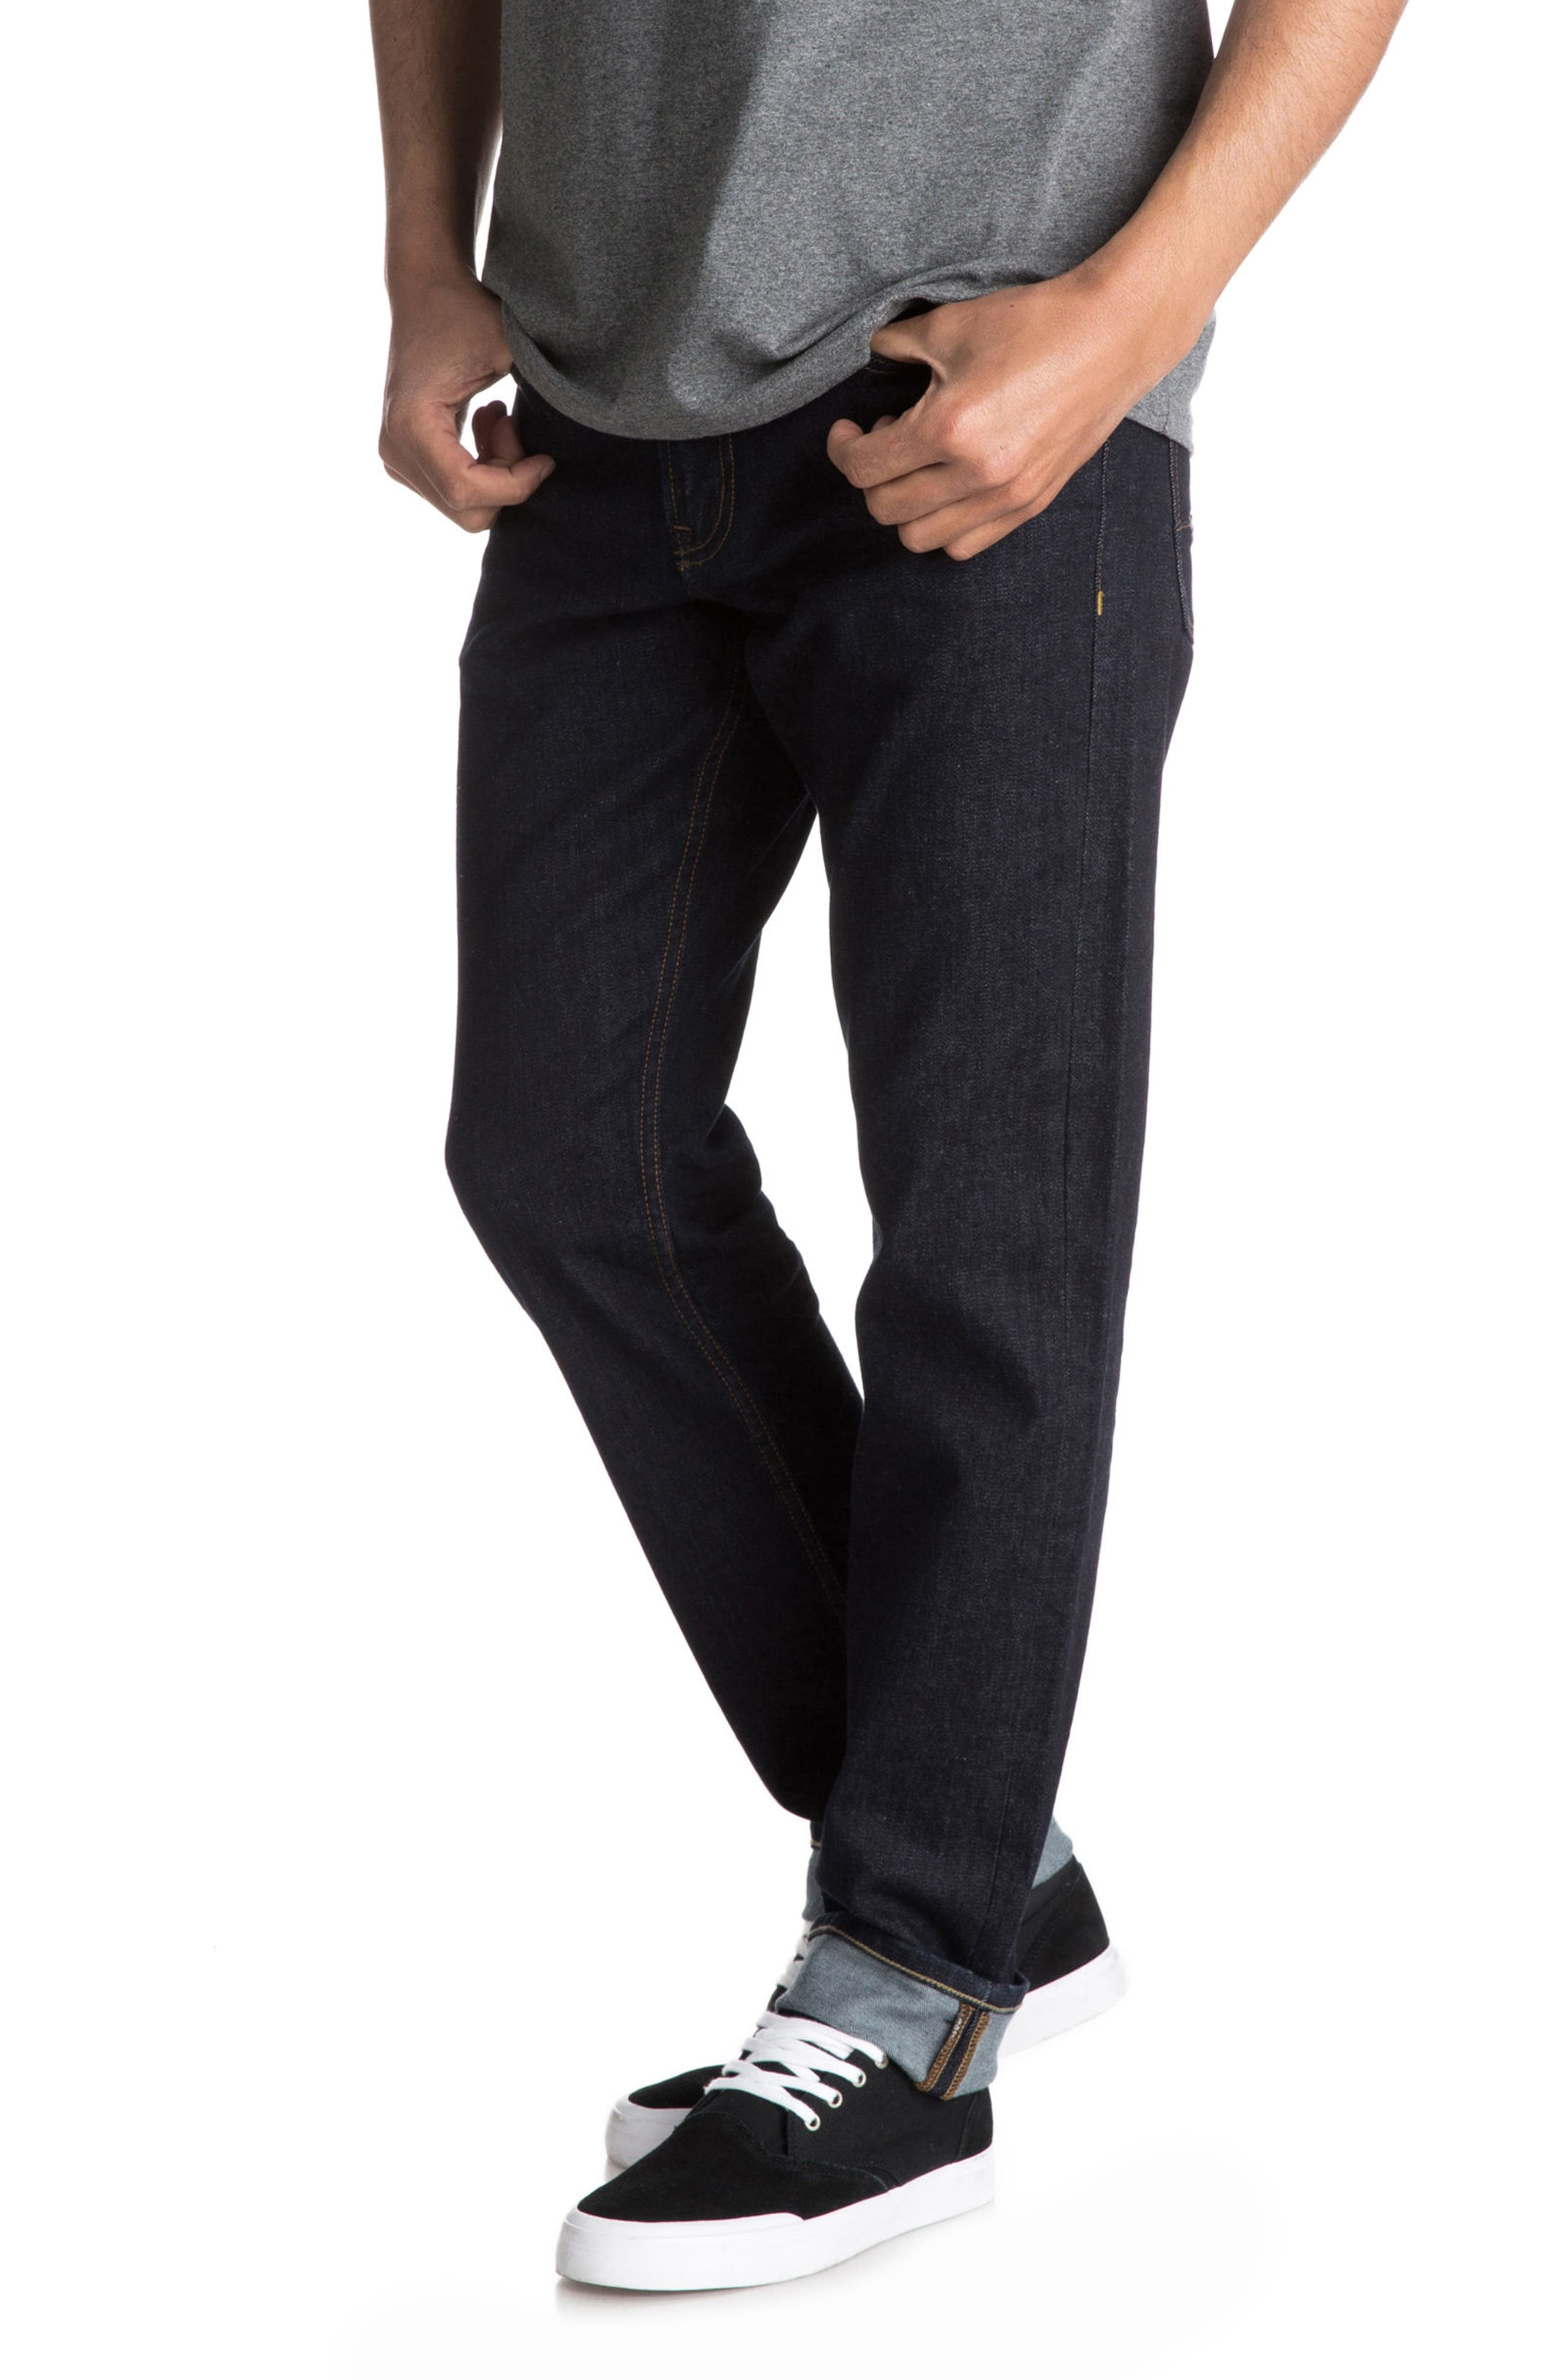 Revolver Slim Fit Jeans,                             Main thumbnail 1, color,                             401